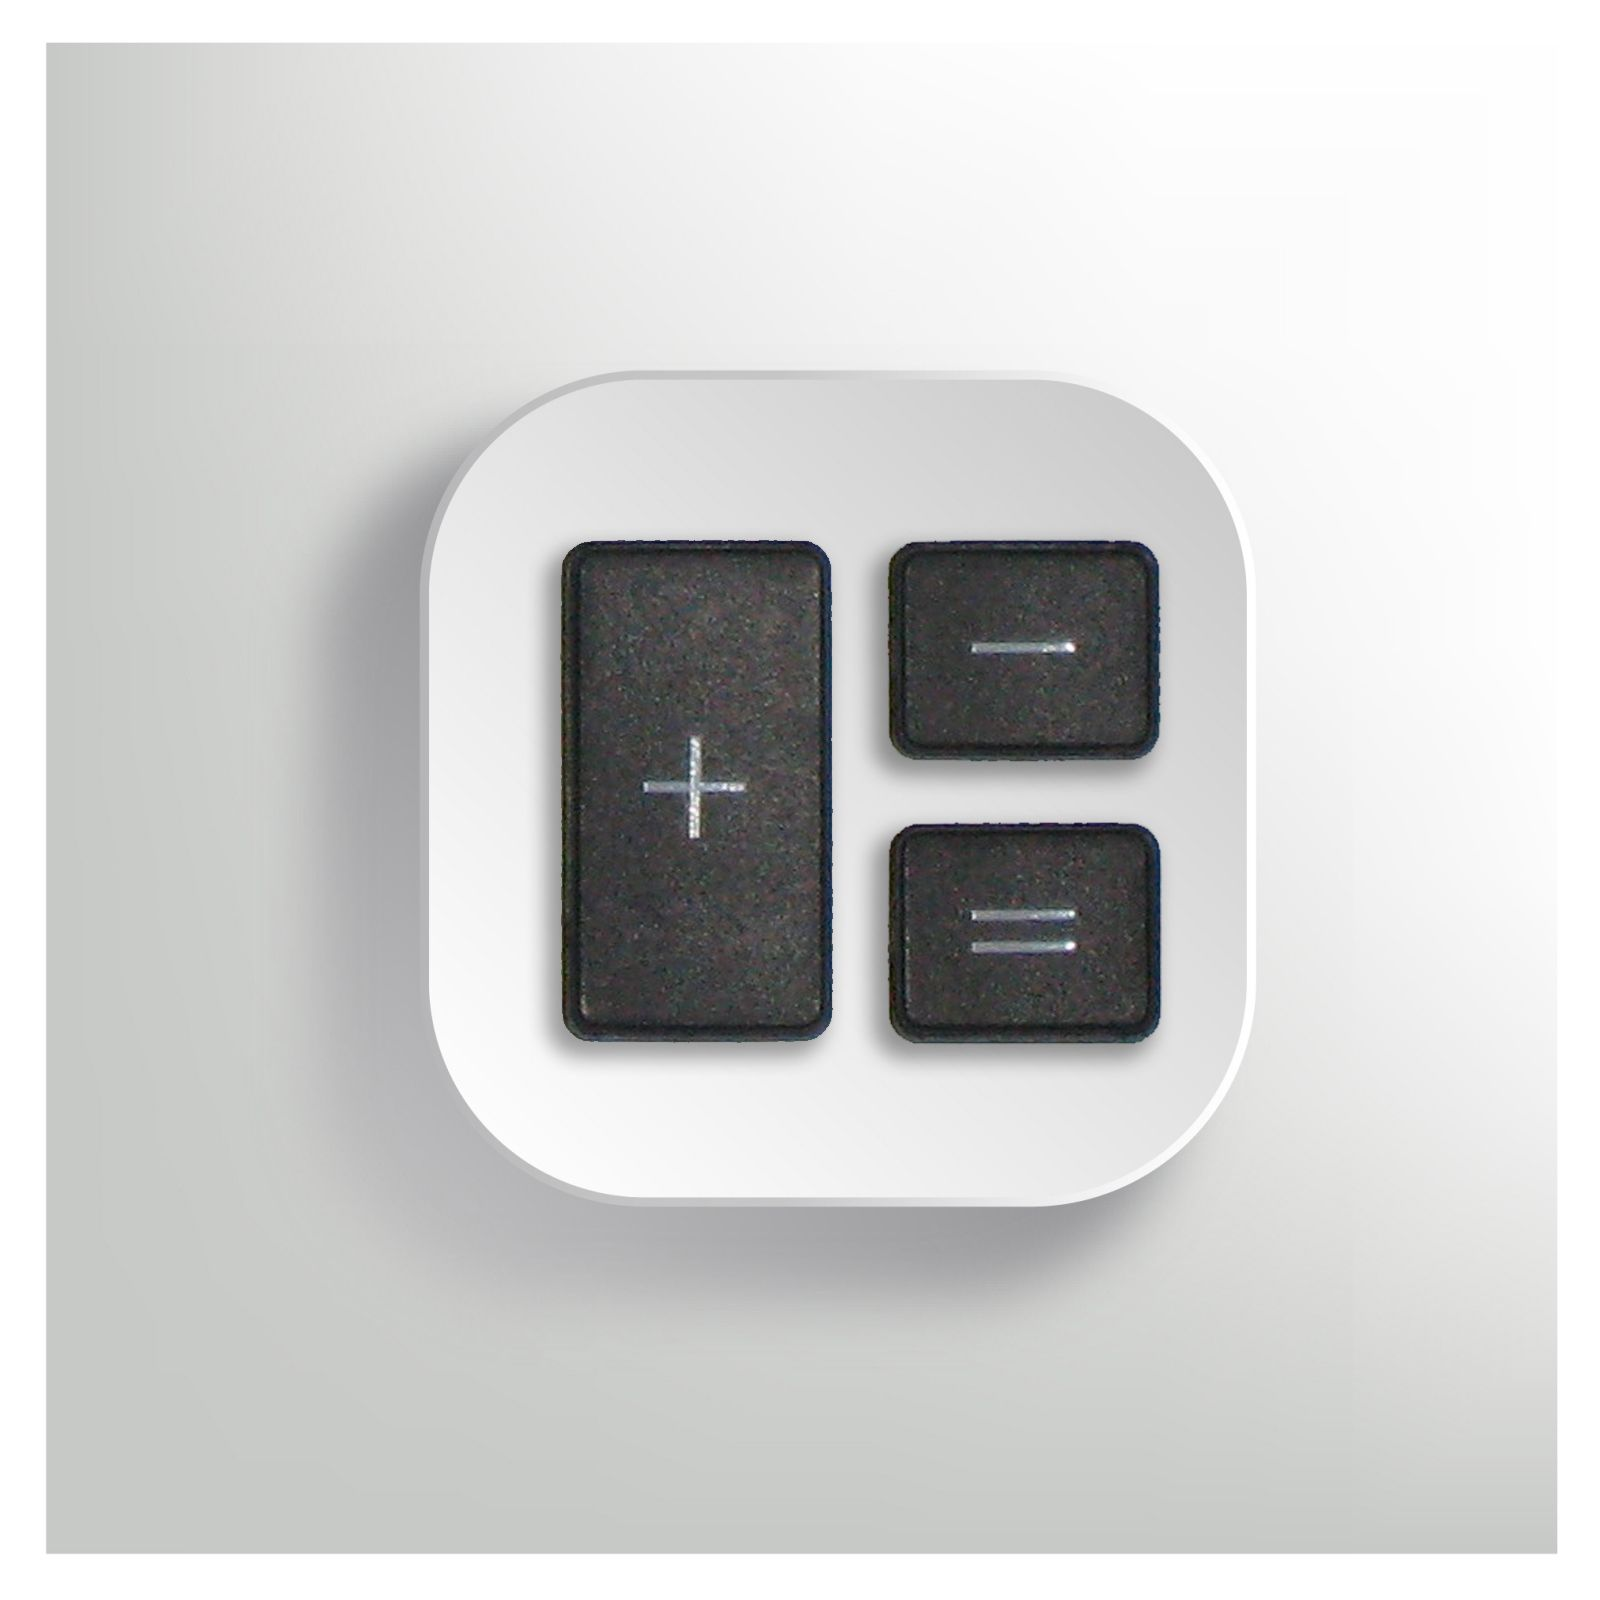 Calculator app icon app icon app icon design